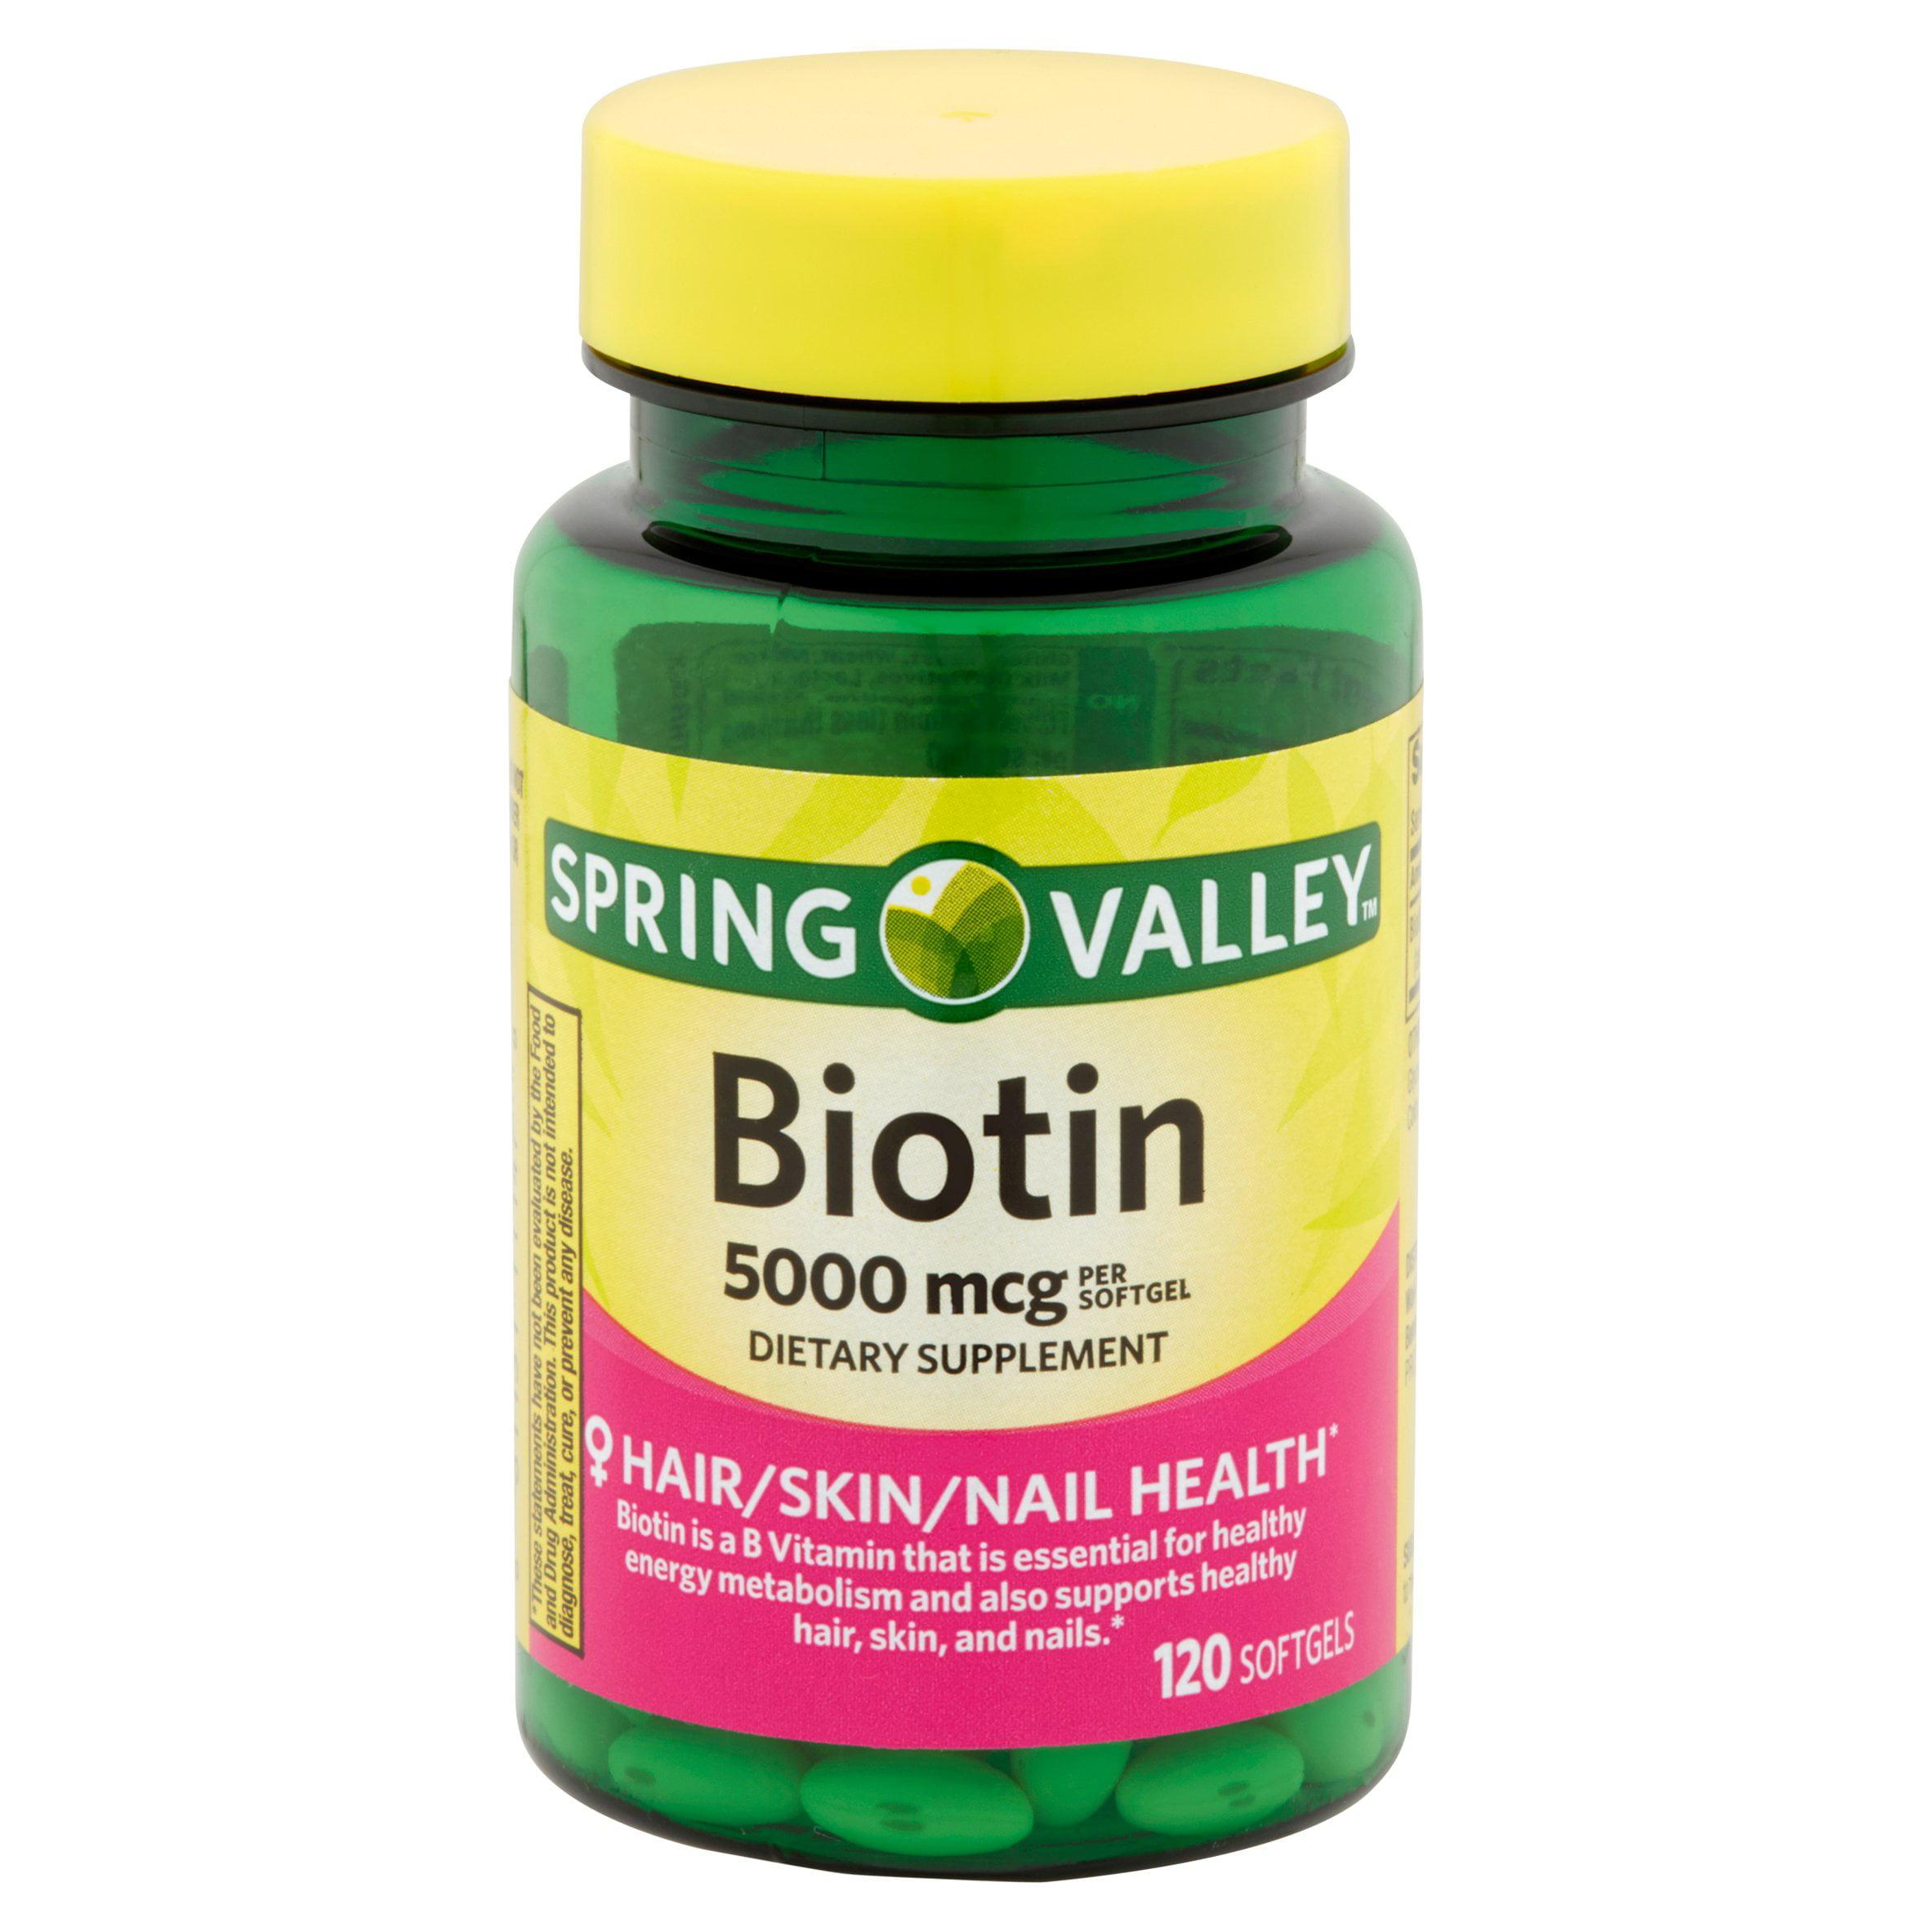 Spring Valley Biotin Softgels 5000 Mcg 120 Ct